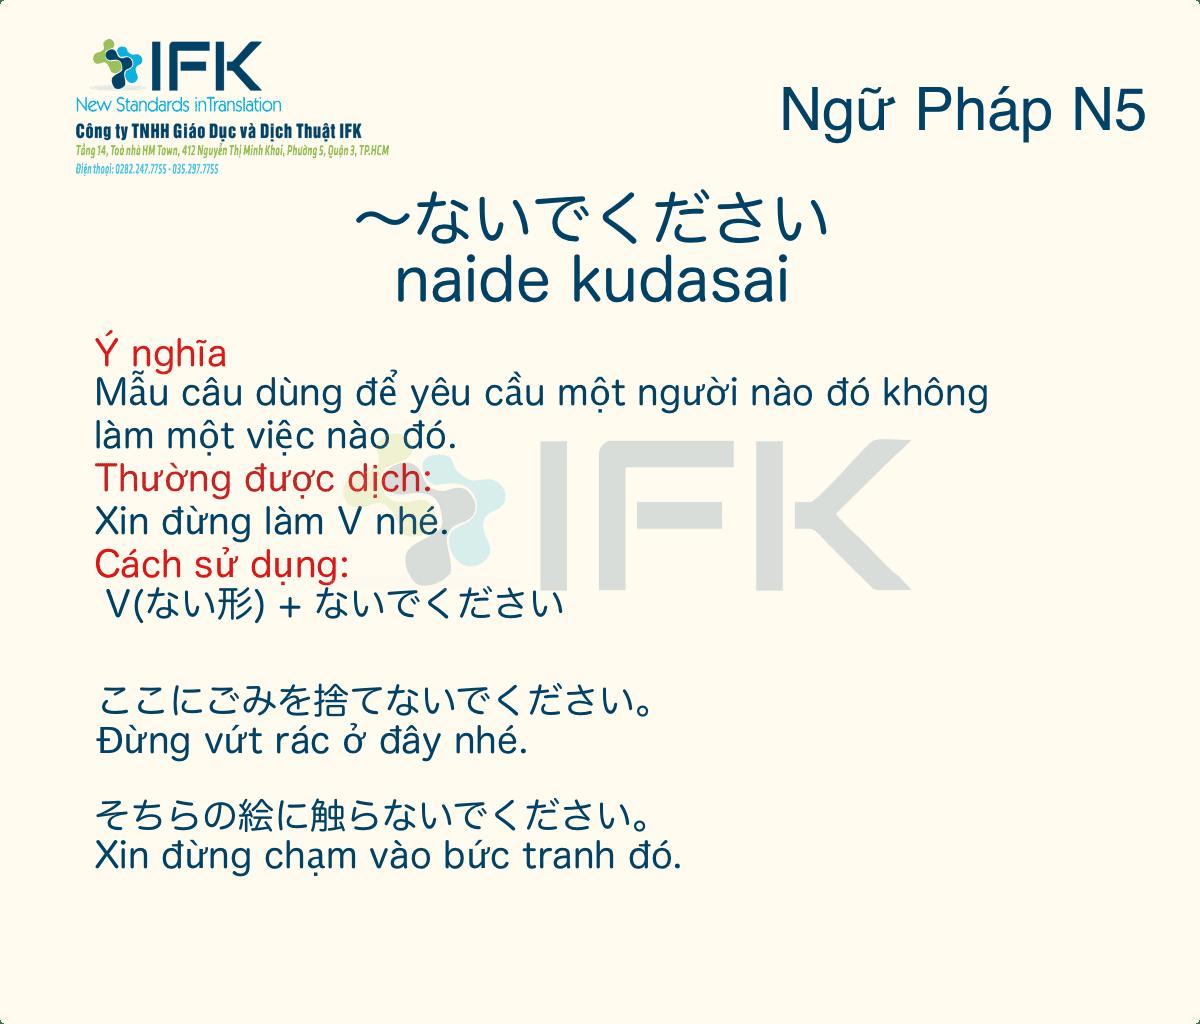 Ngu Phap N5 ないでください